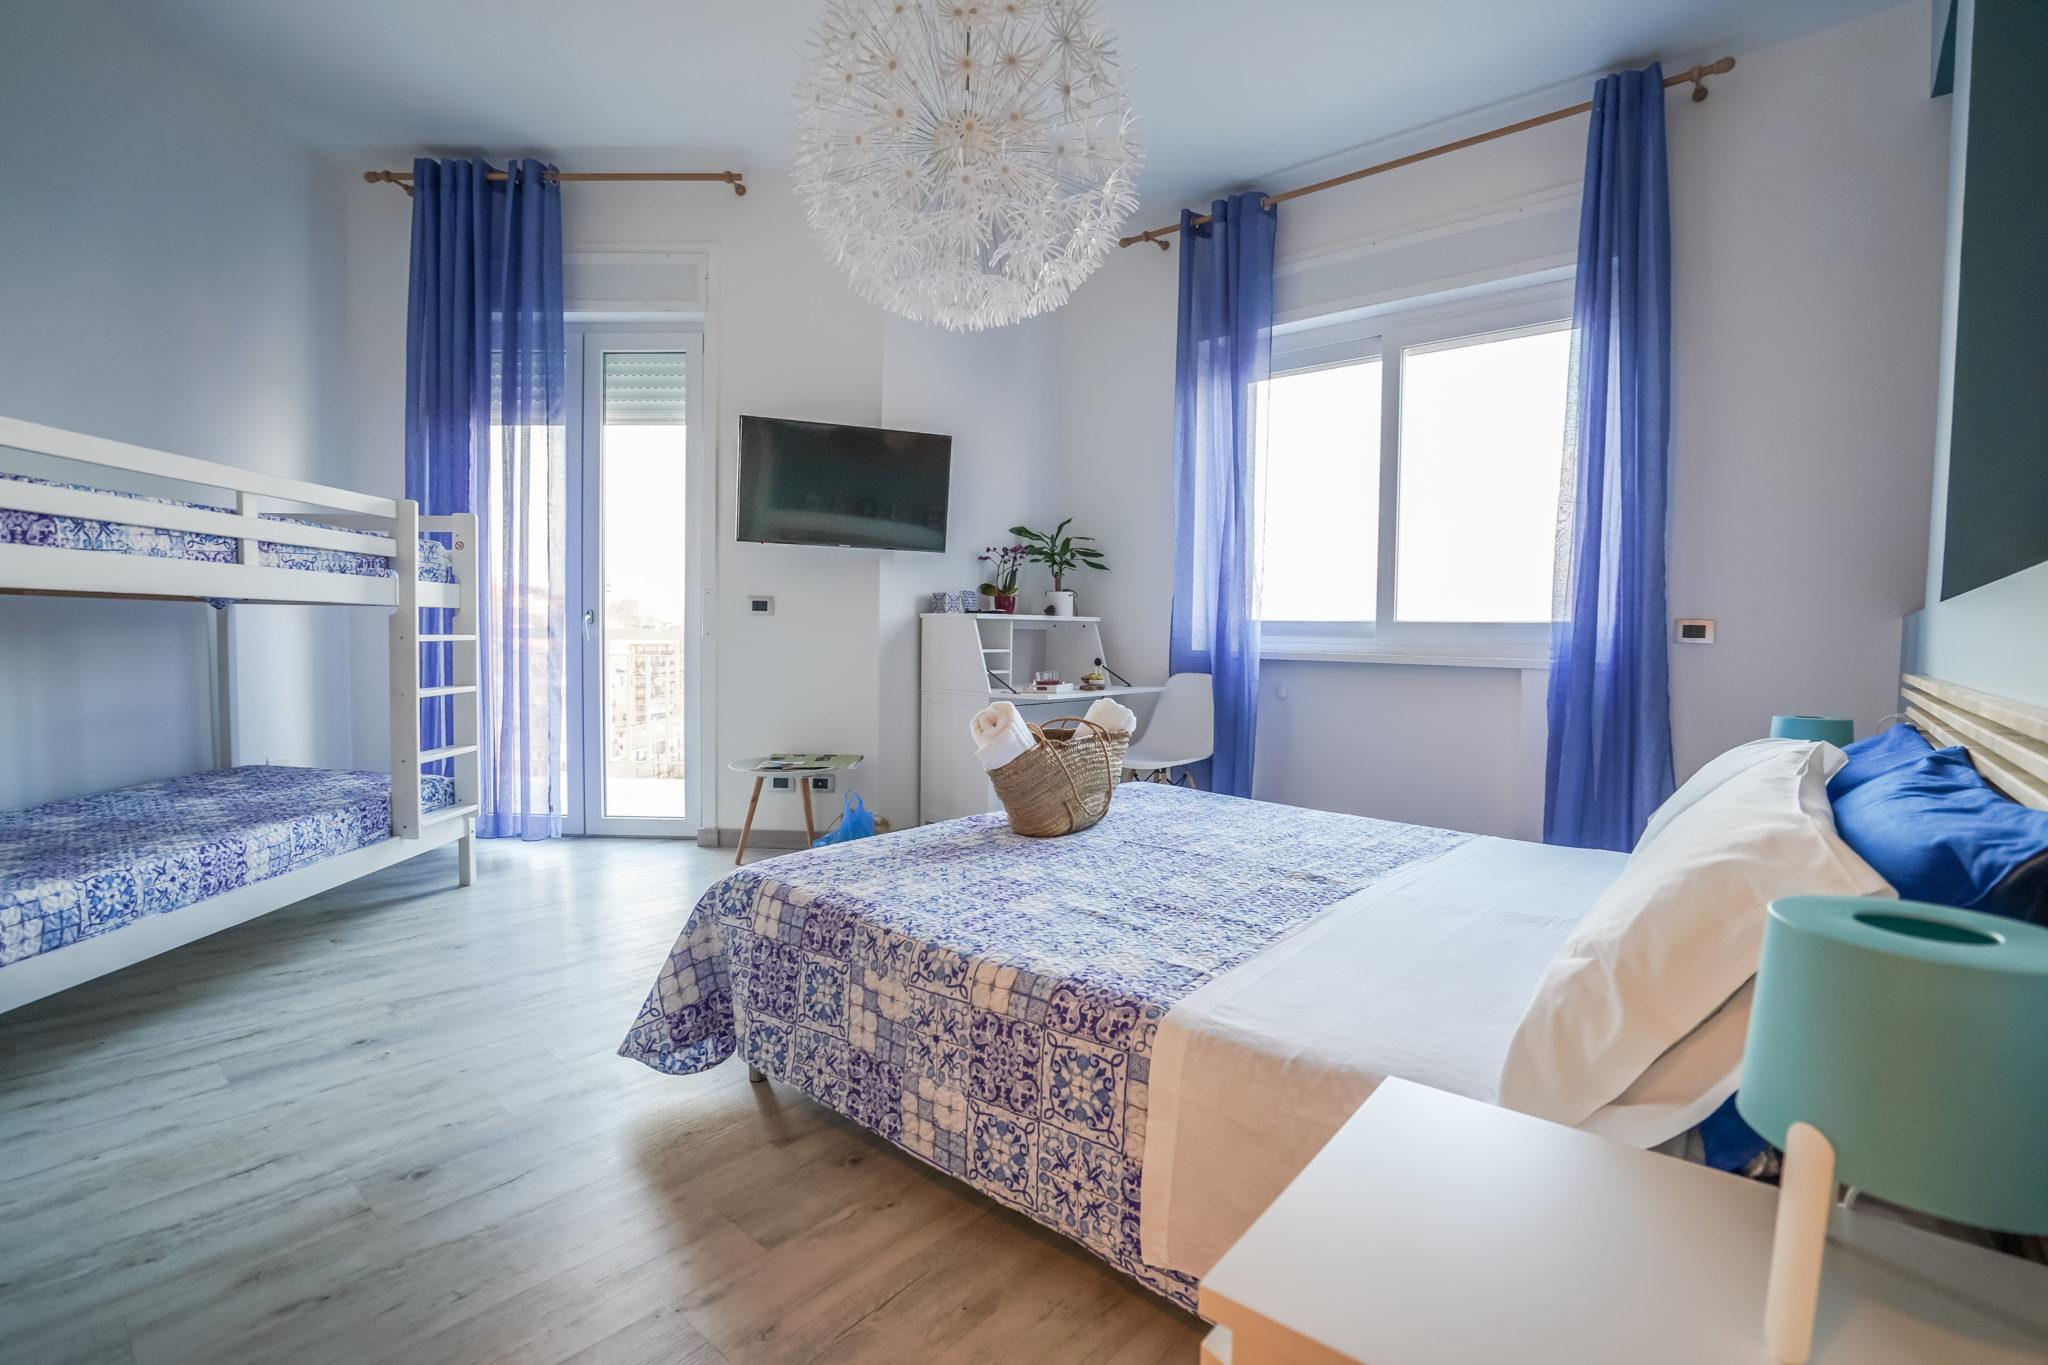 Agrigente-sicile-italie-hotel-dormir